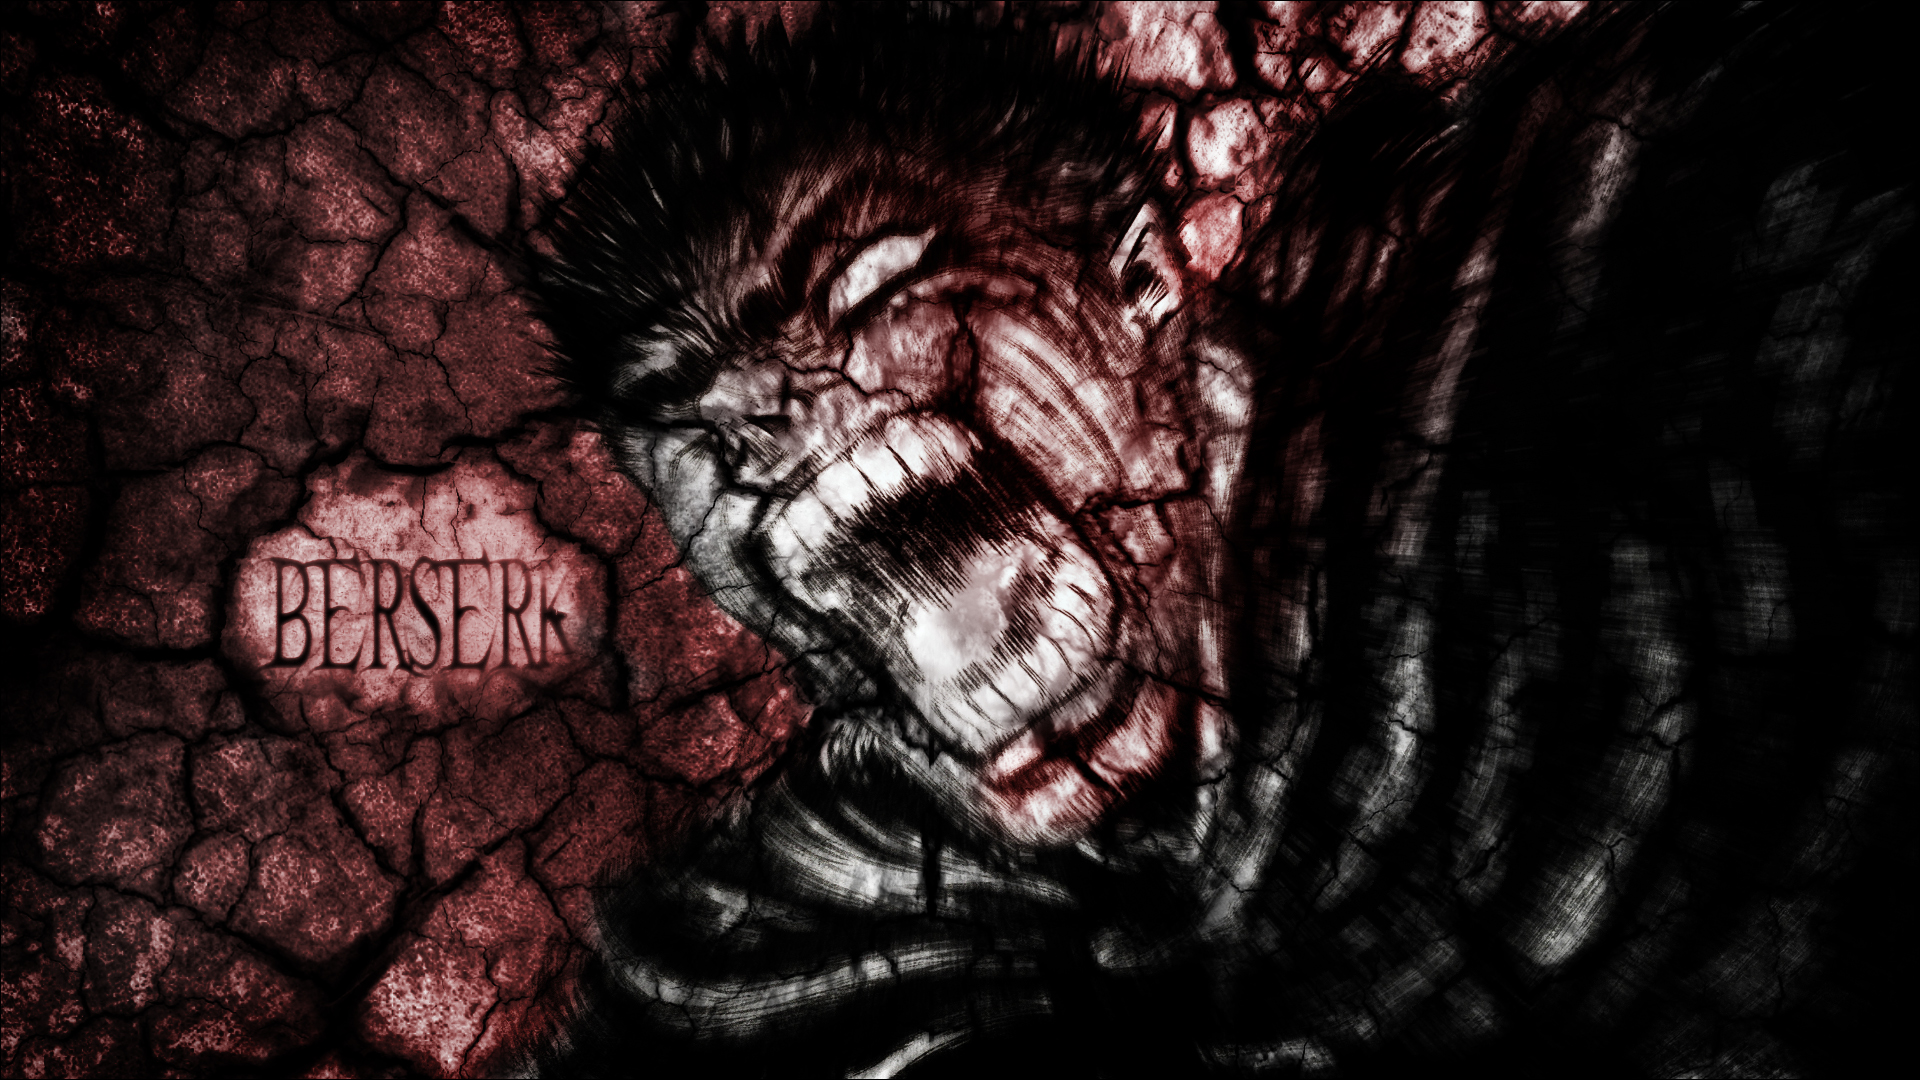 berserk guts rage wallpaper by edd000 manga anime digital media 1920x1080